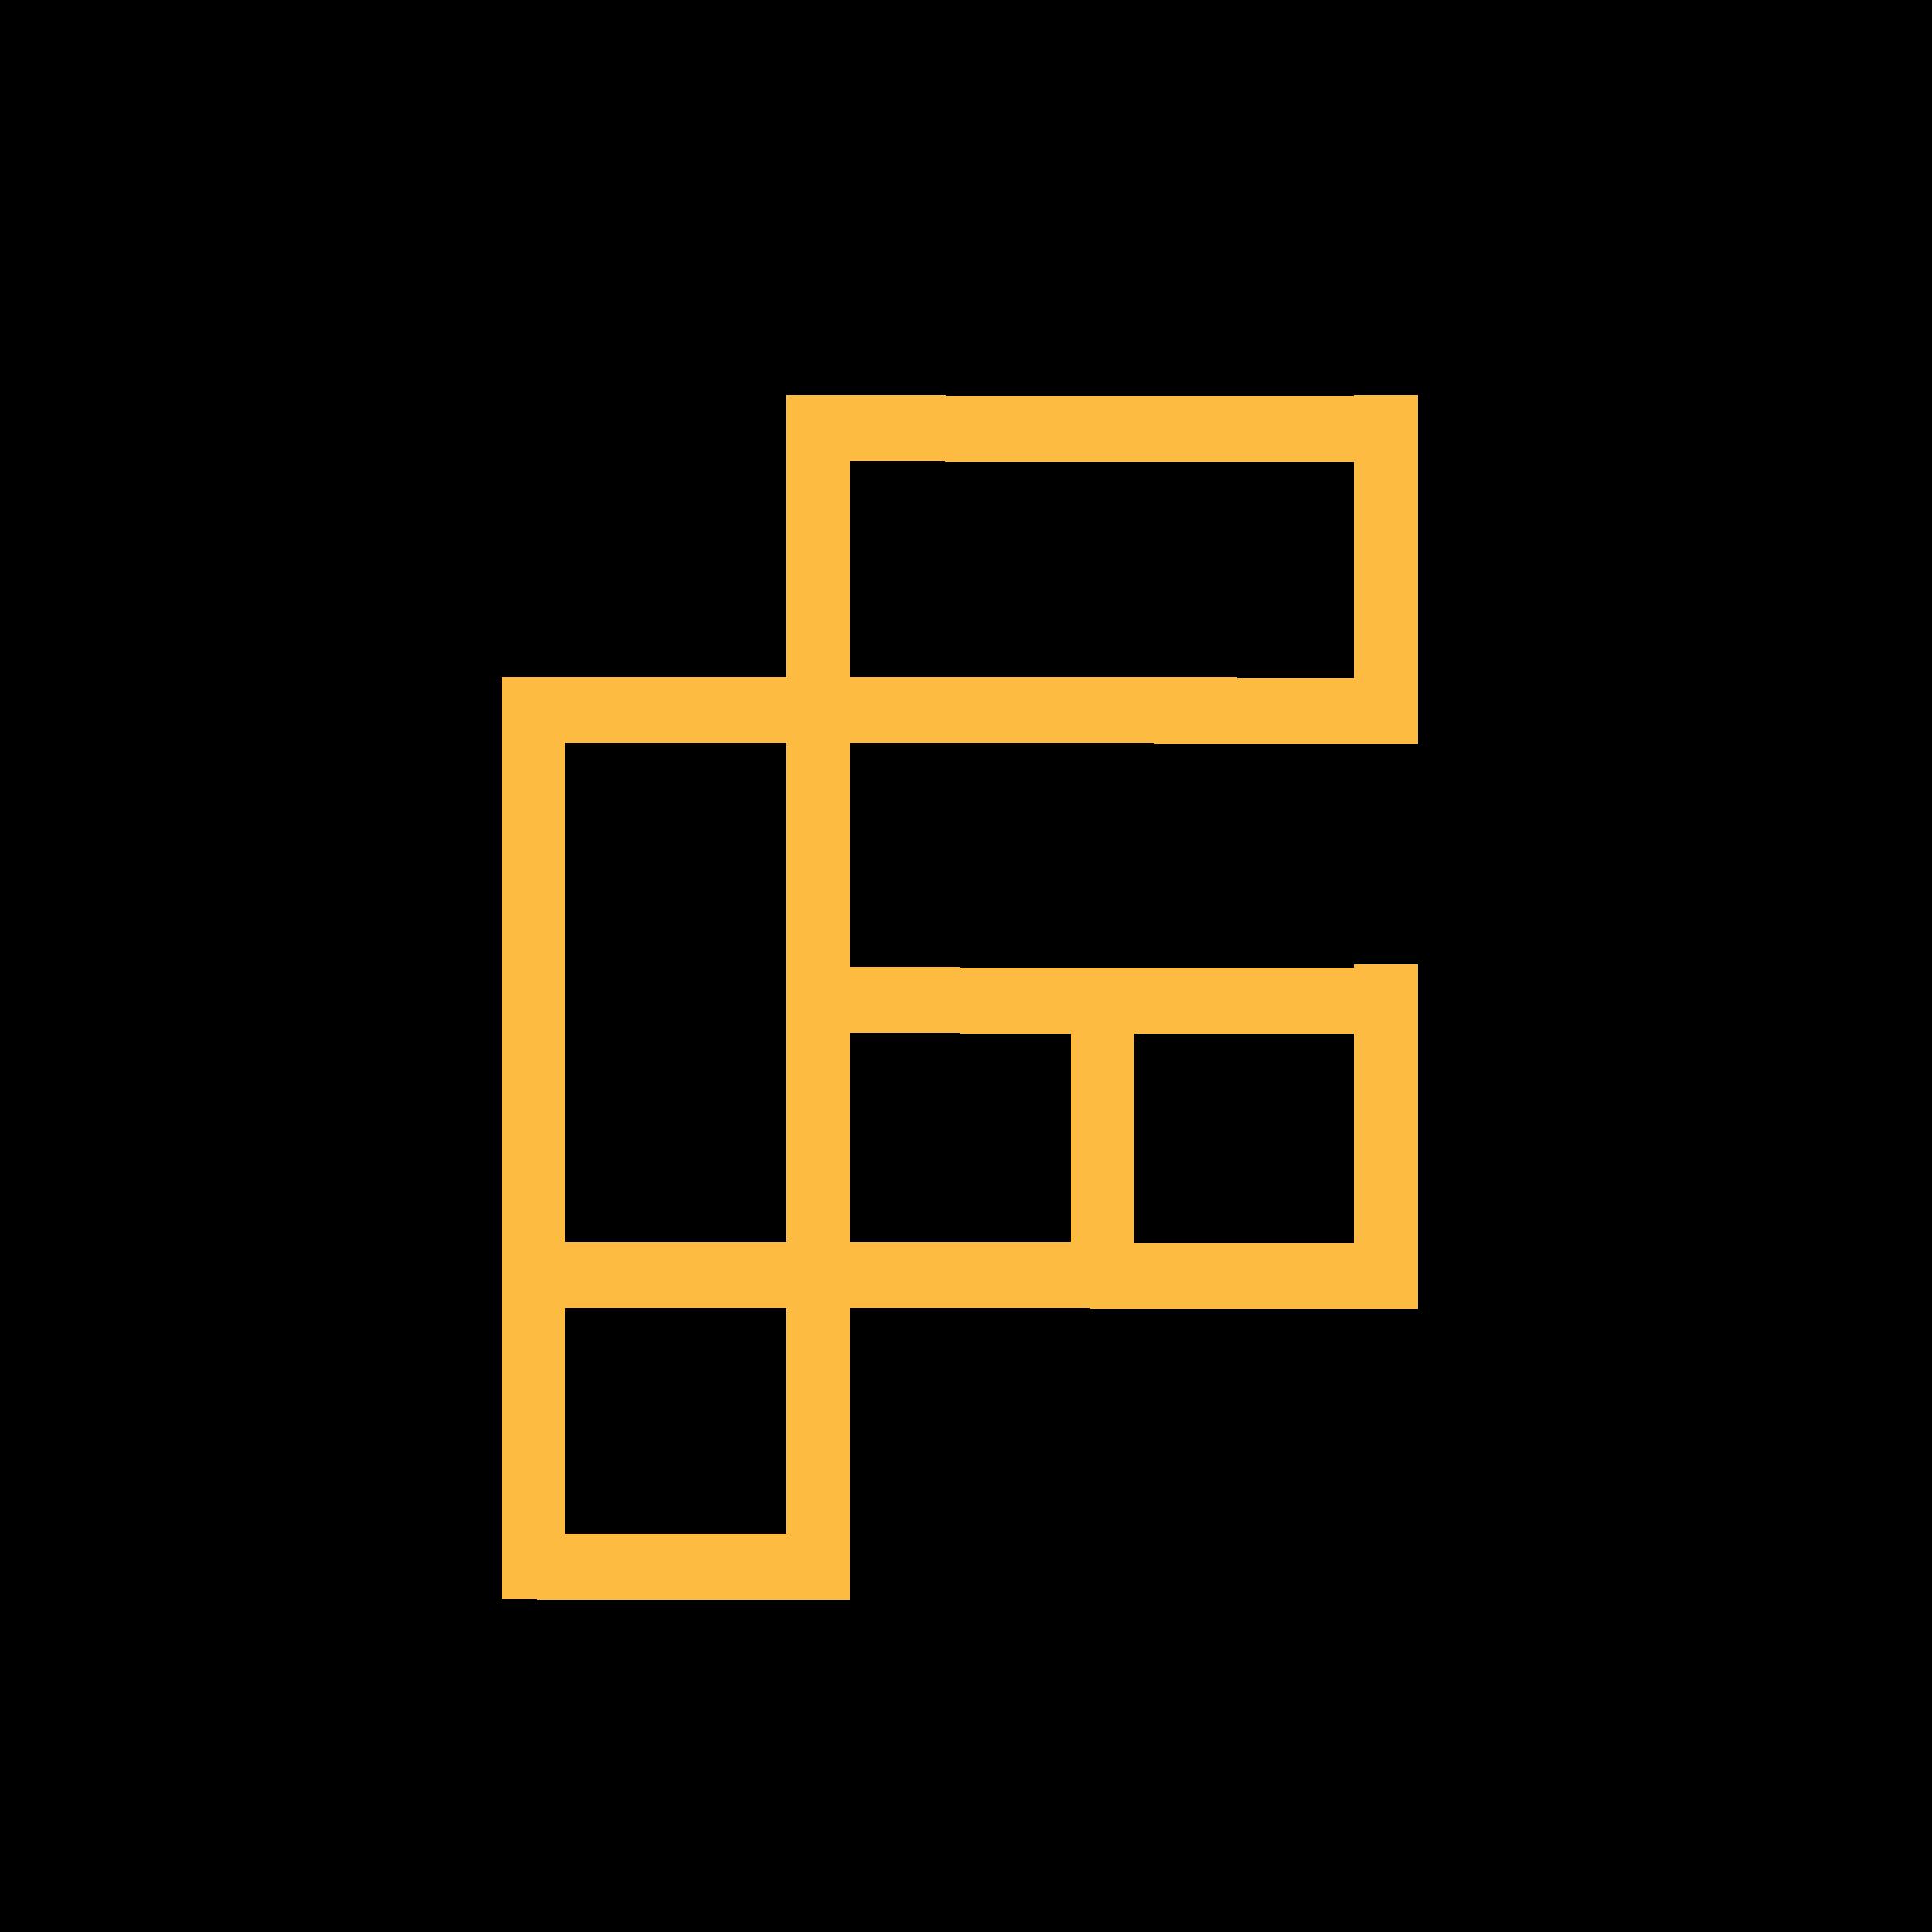 Logoupdate